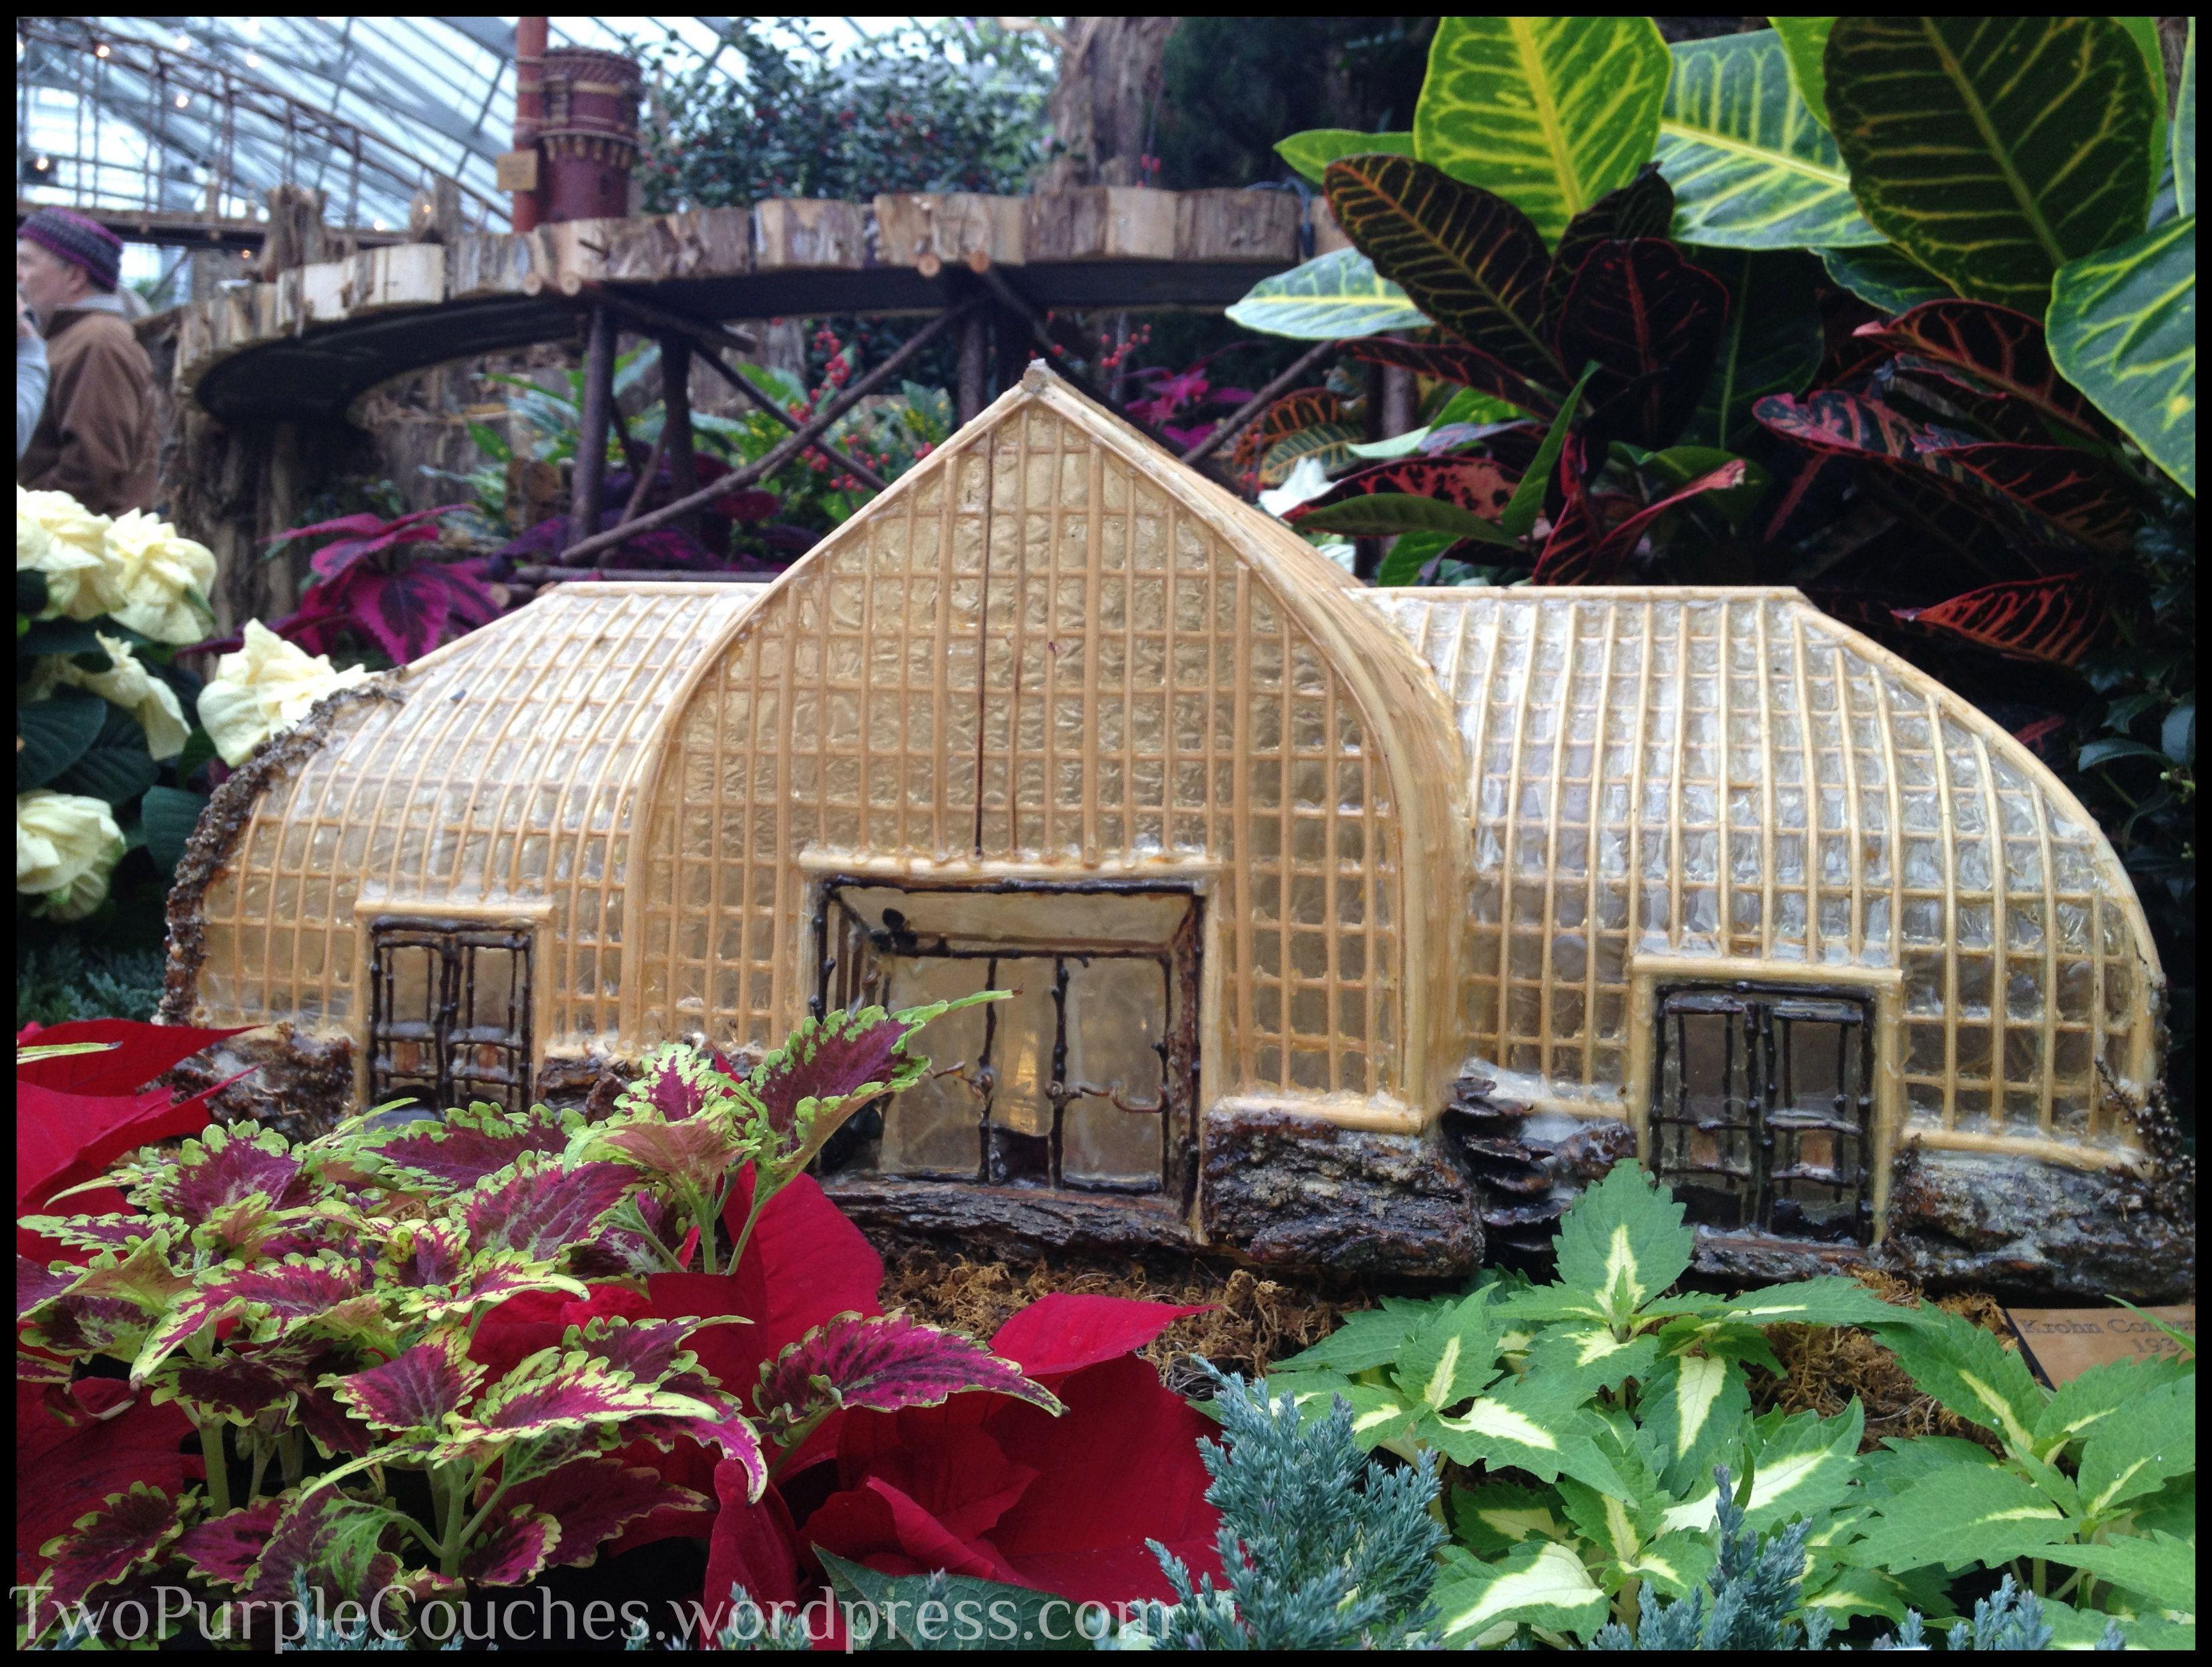 Holiday Traditions: Krohn Conservatory Pointsettia & Train Display ...